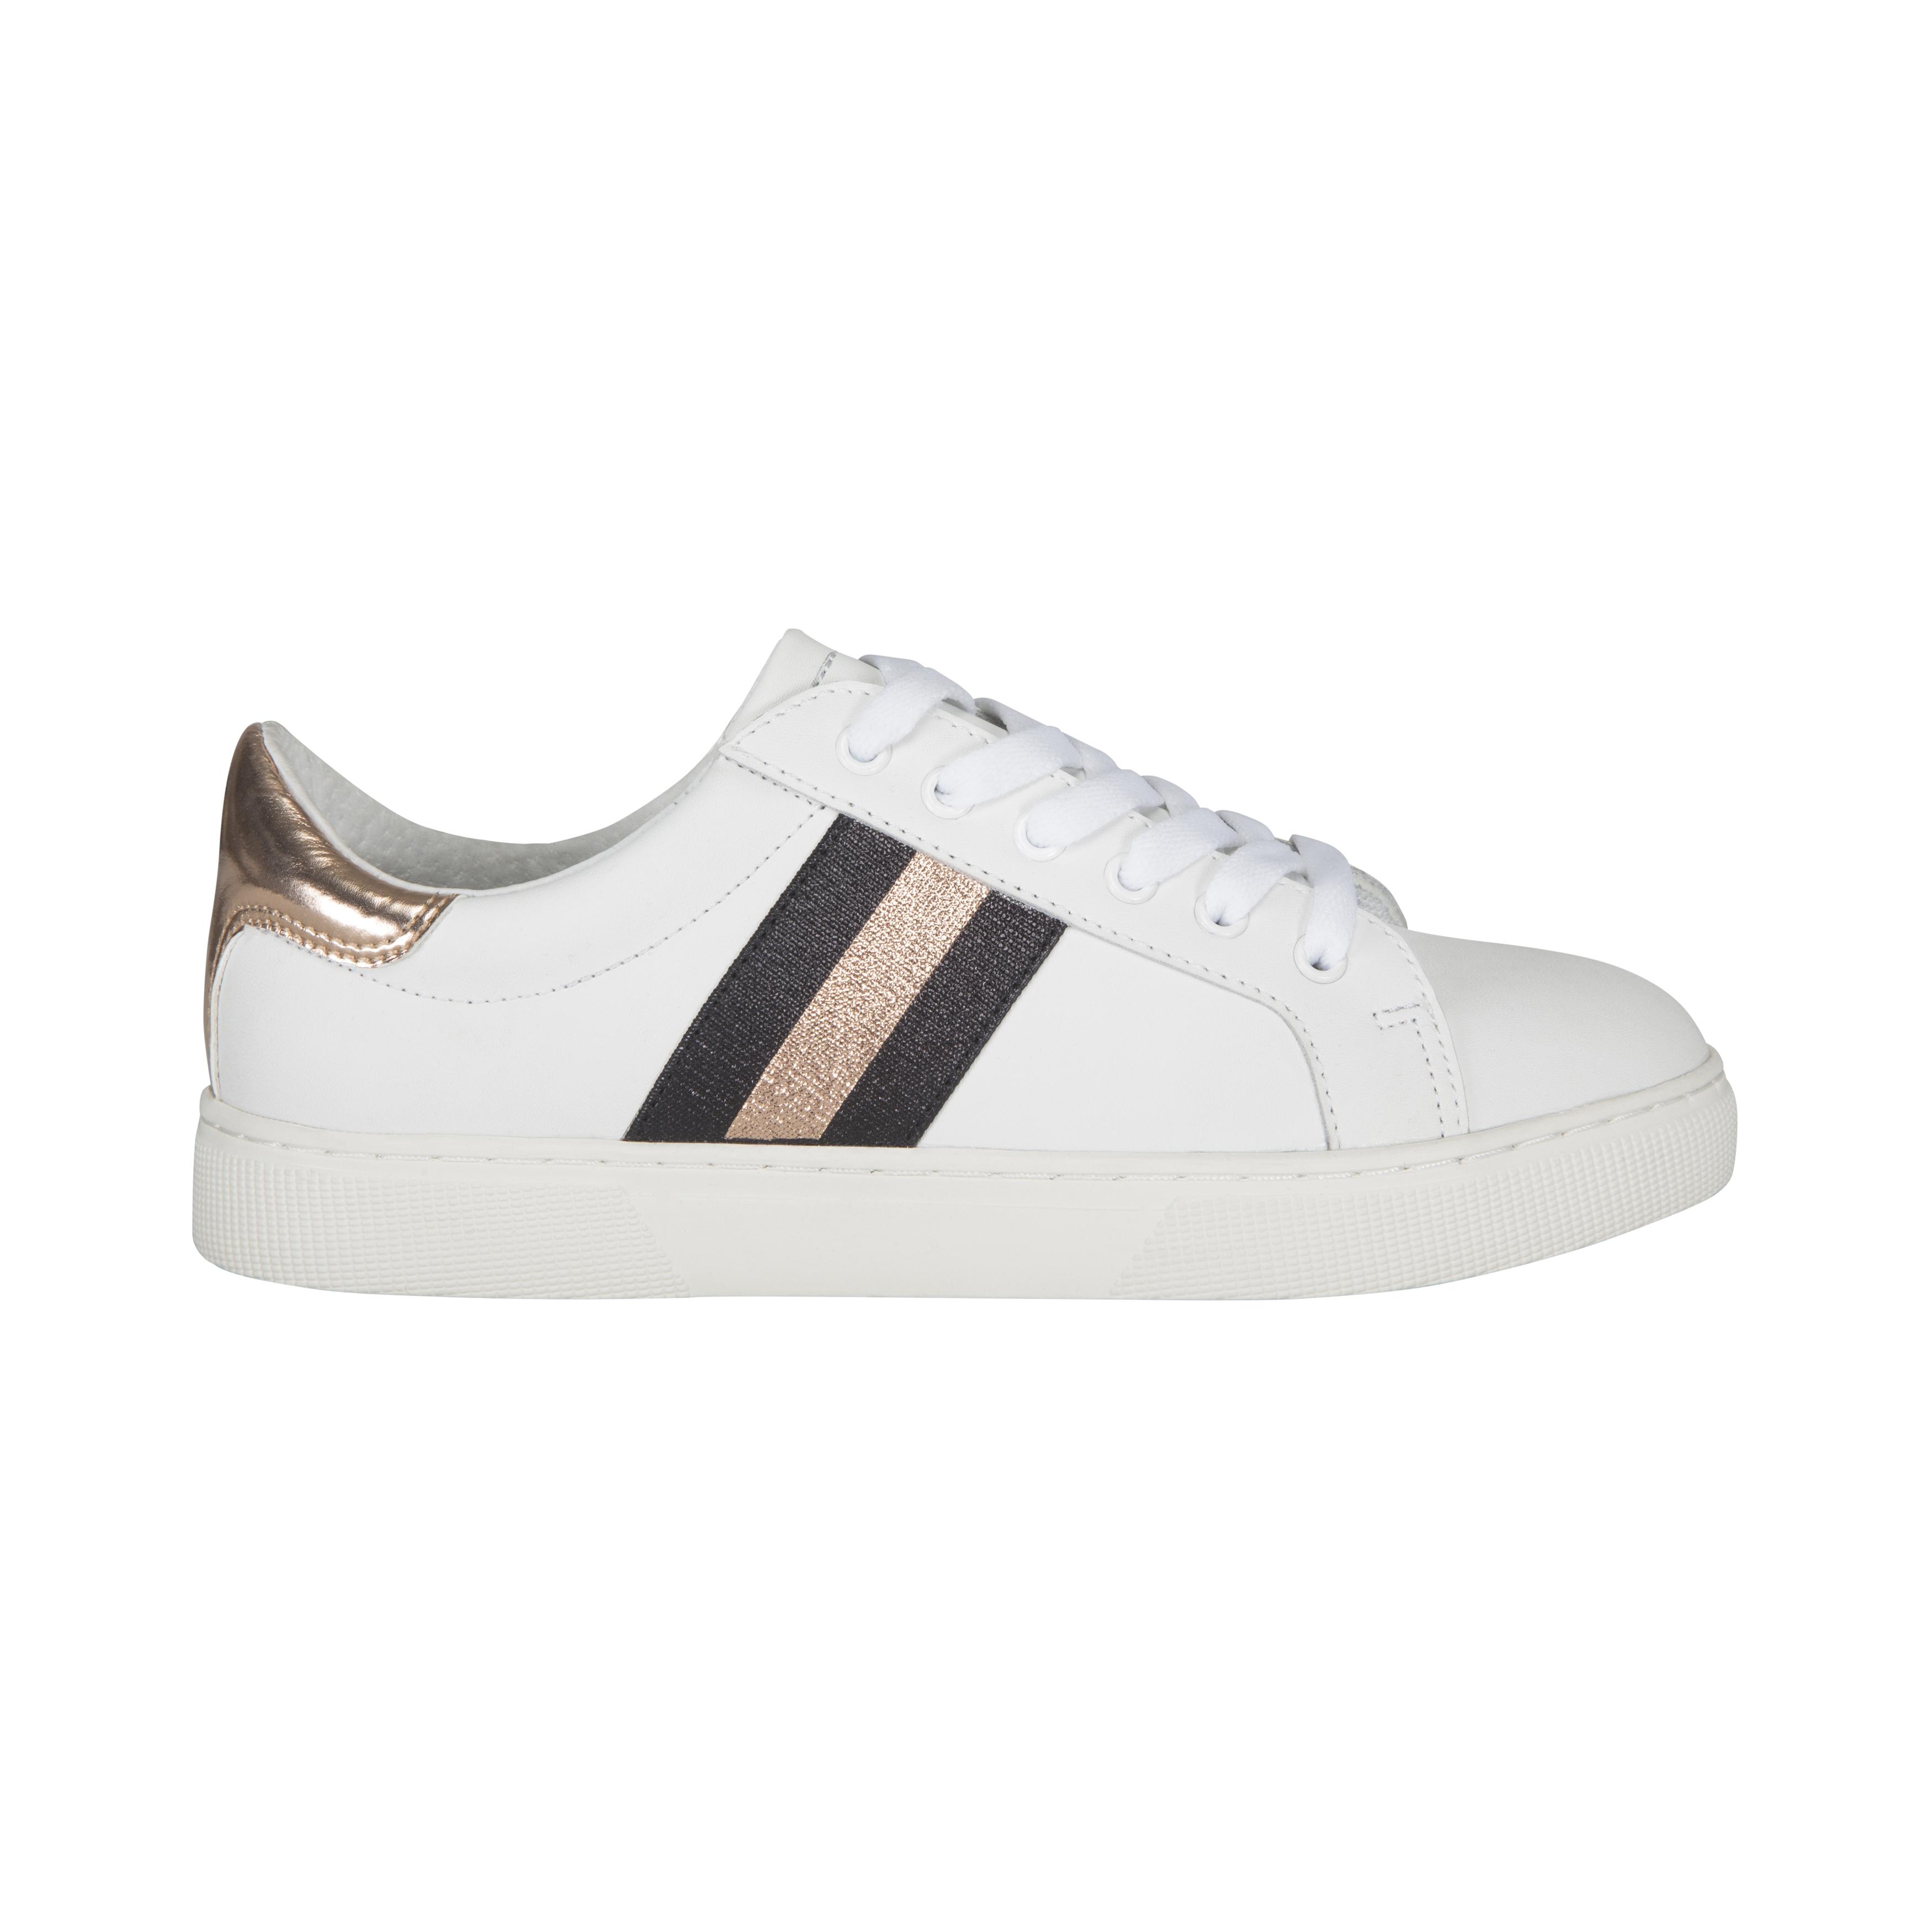 Sofie Schnoor Sneaker elastic Hvid